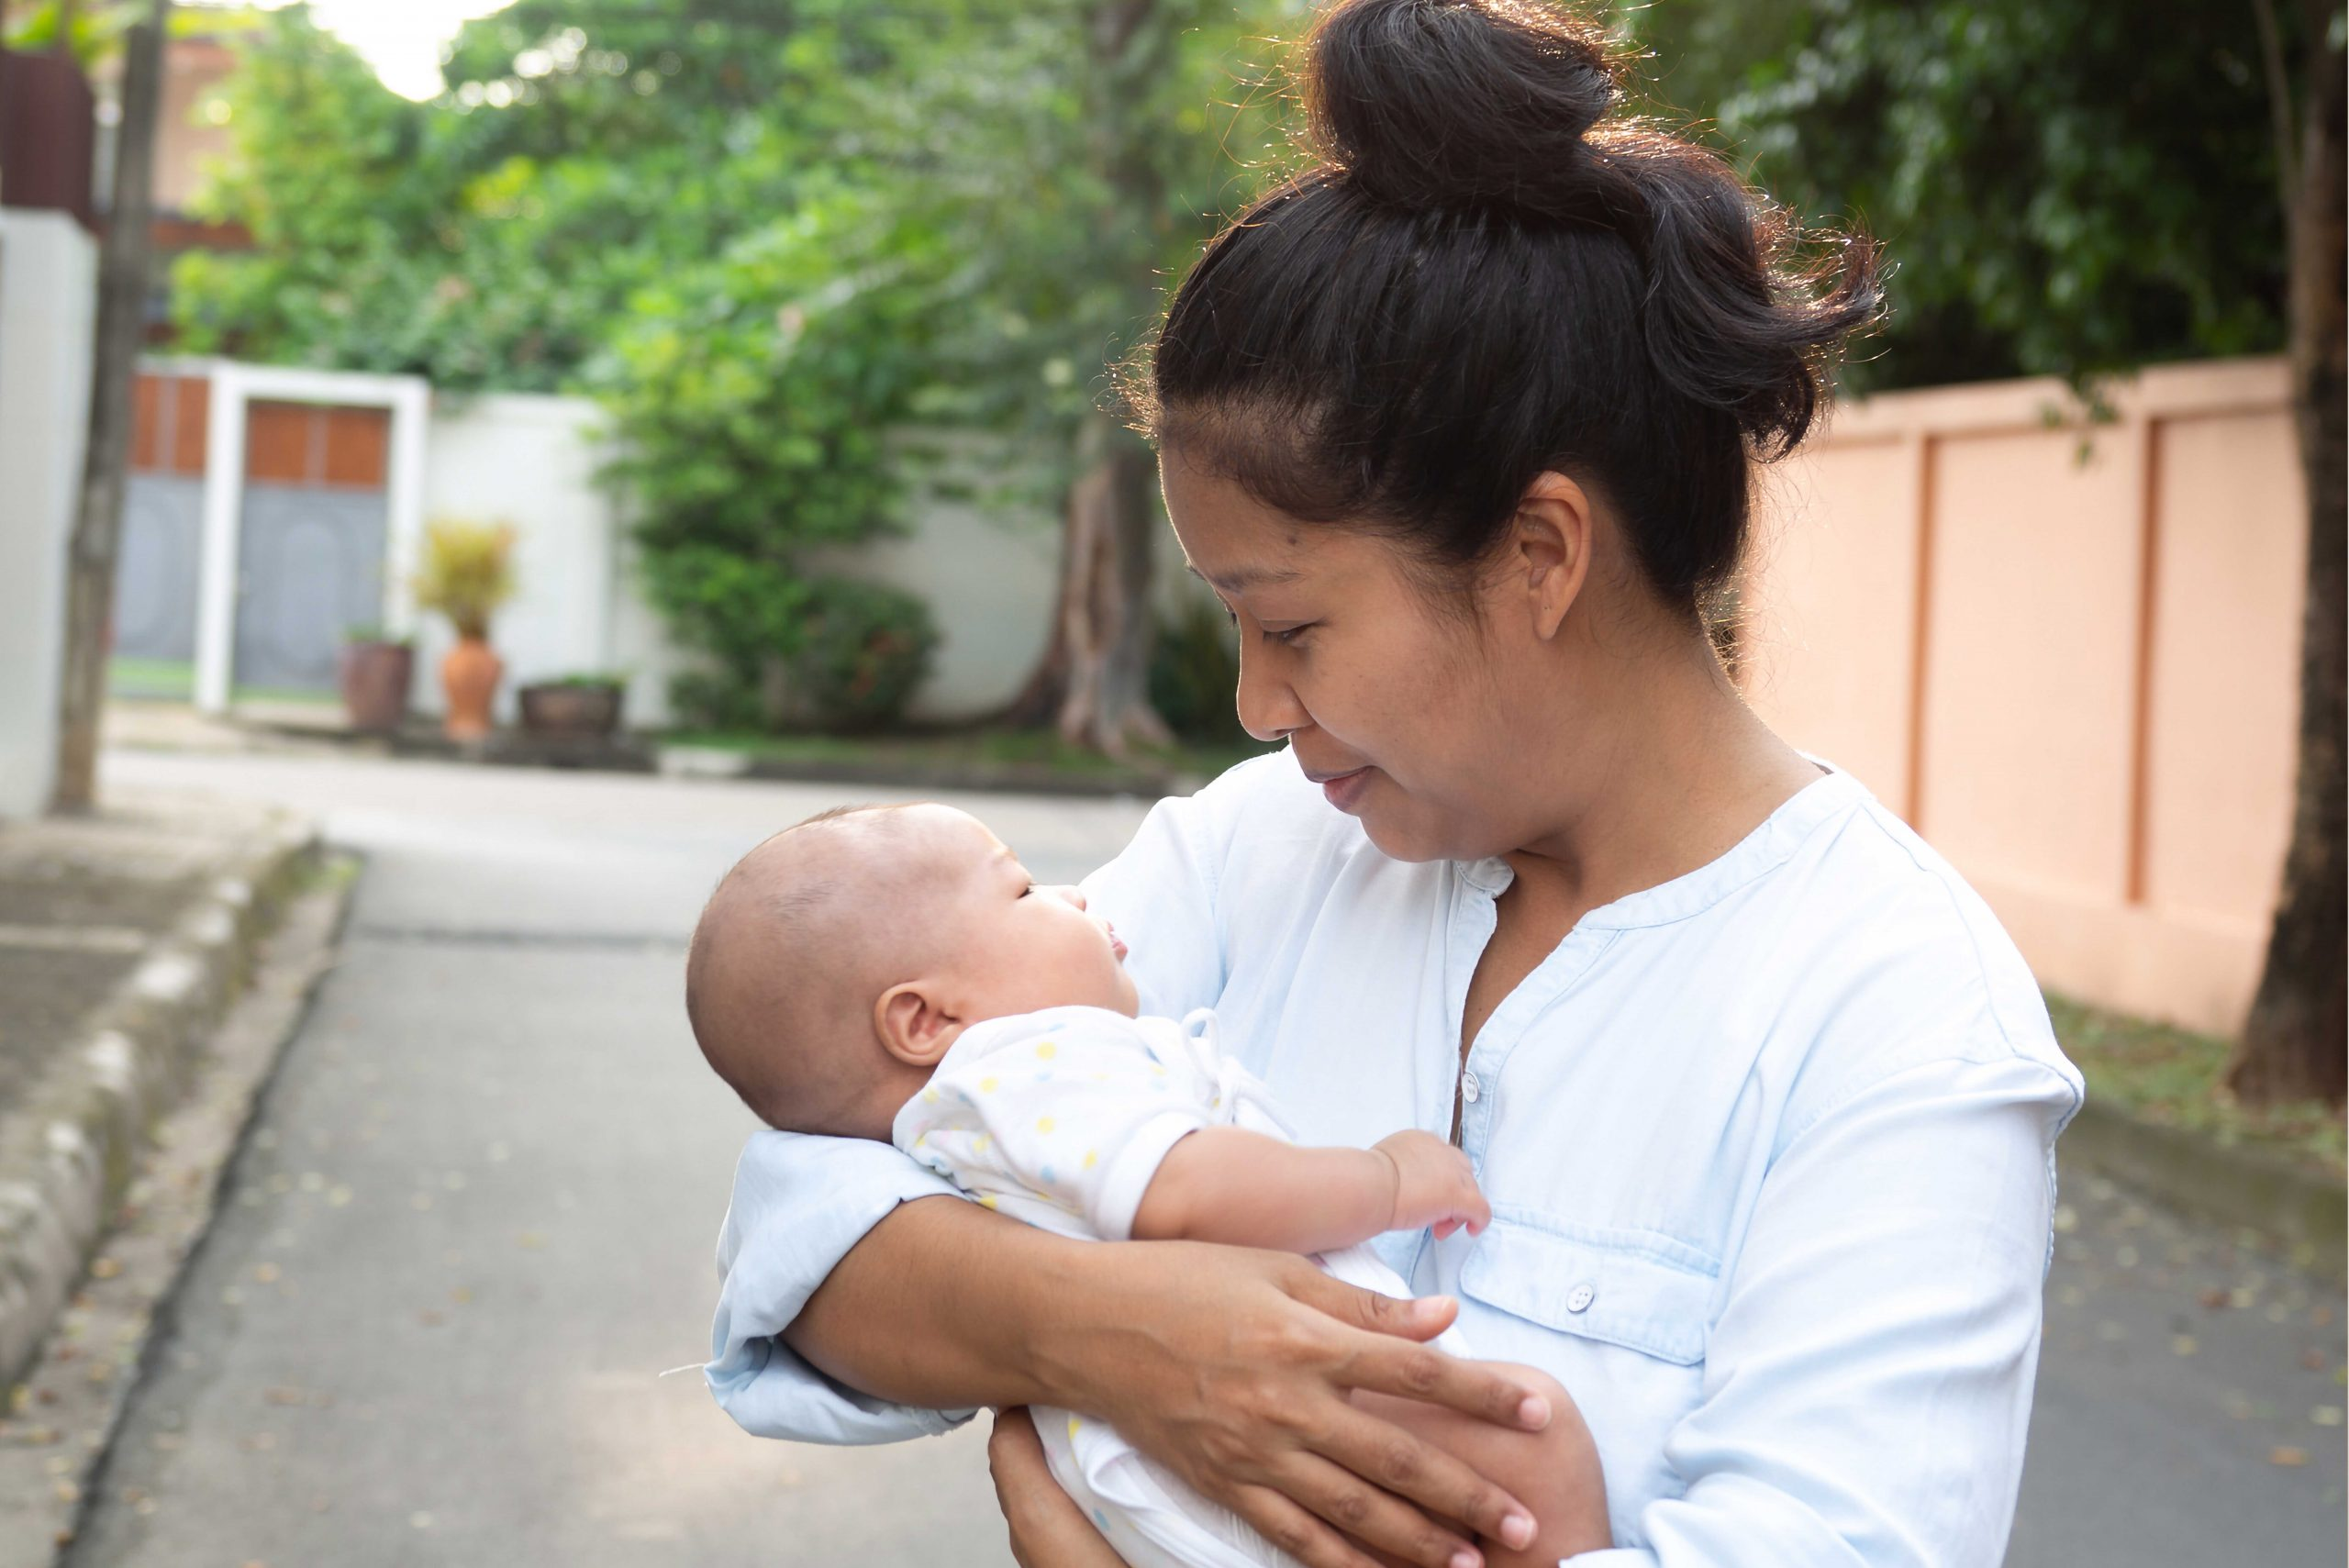 Filipino maid agency Singapore Image 2